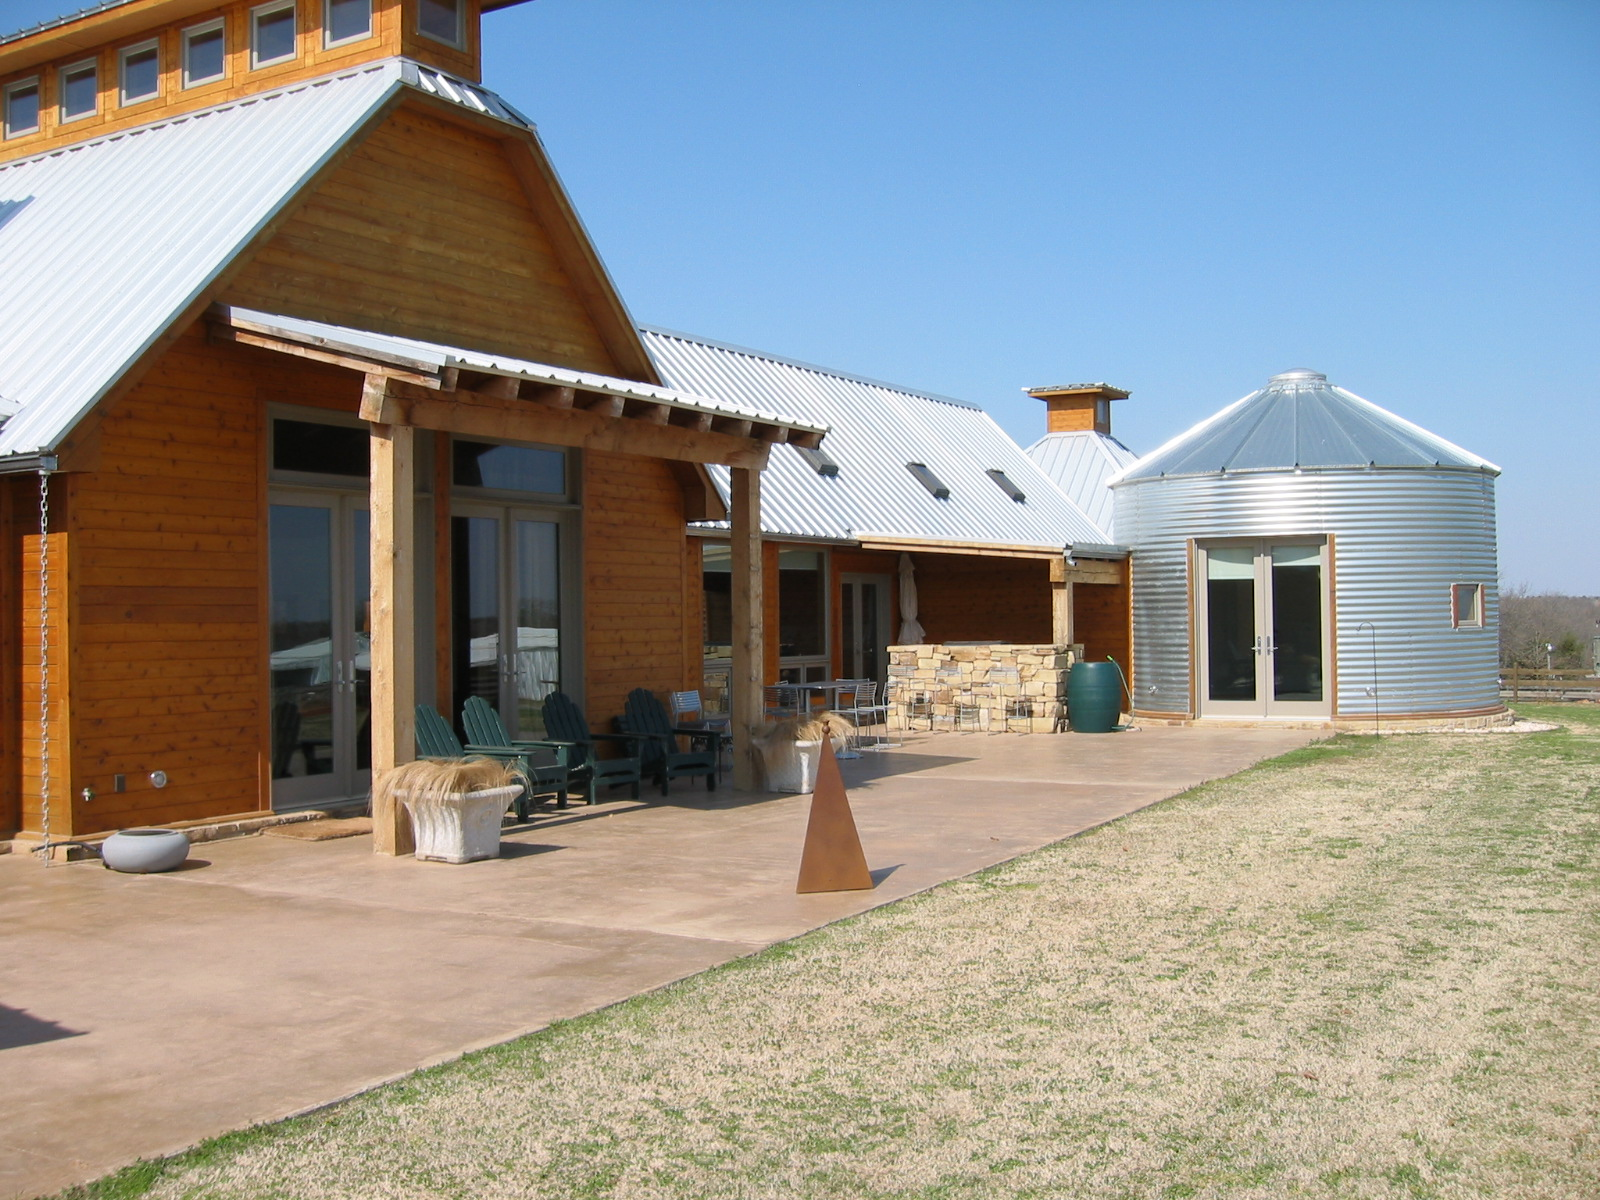 Breeze Hill Ranch